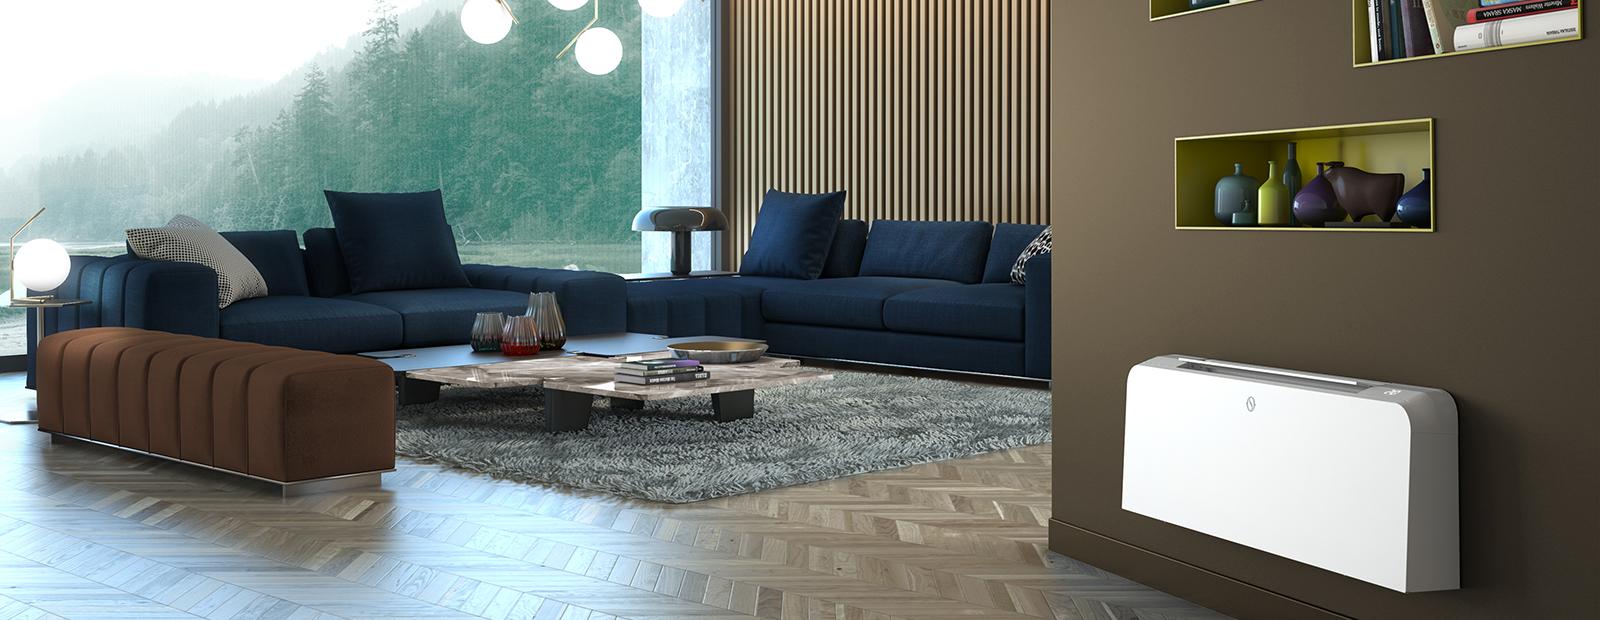 bi2 wall inverter olimpia splendid. Black Bedroom Furniture Sets. Home Design Ideas